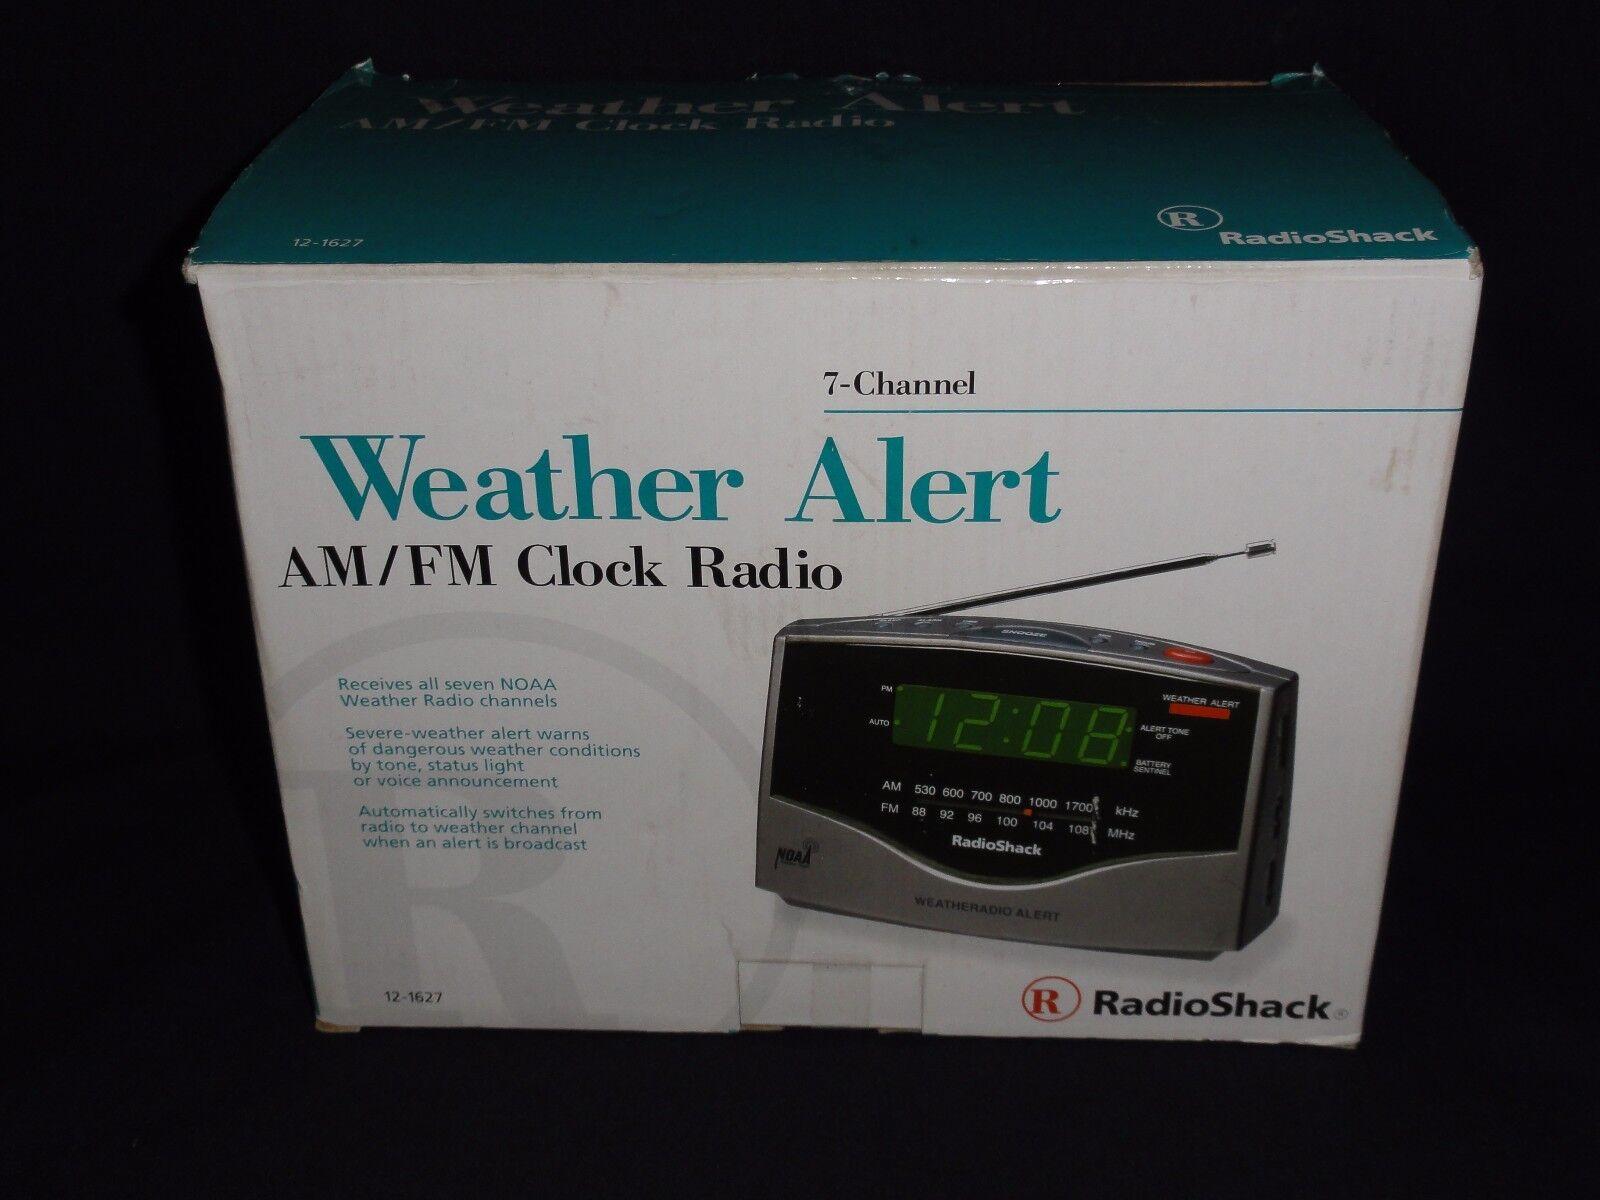 Radio Shack - Weather Alert AM FM Clock Radio 7-Channel